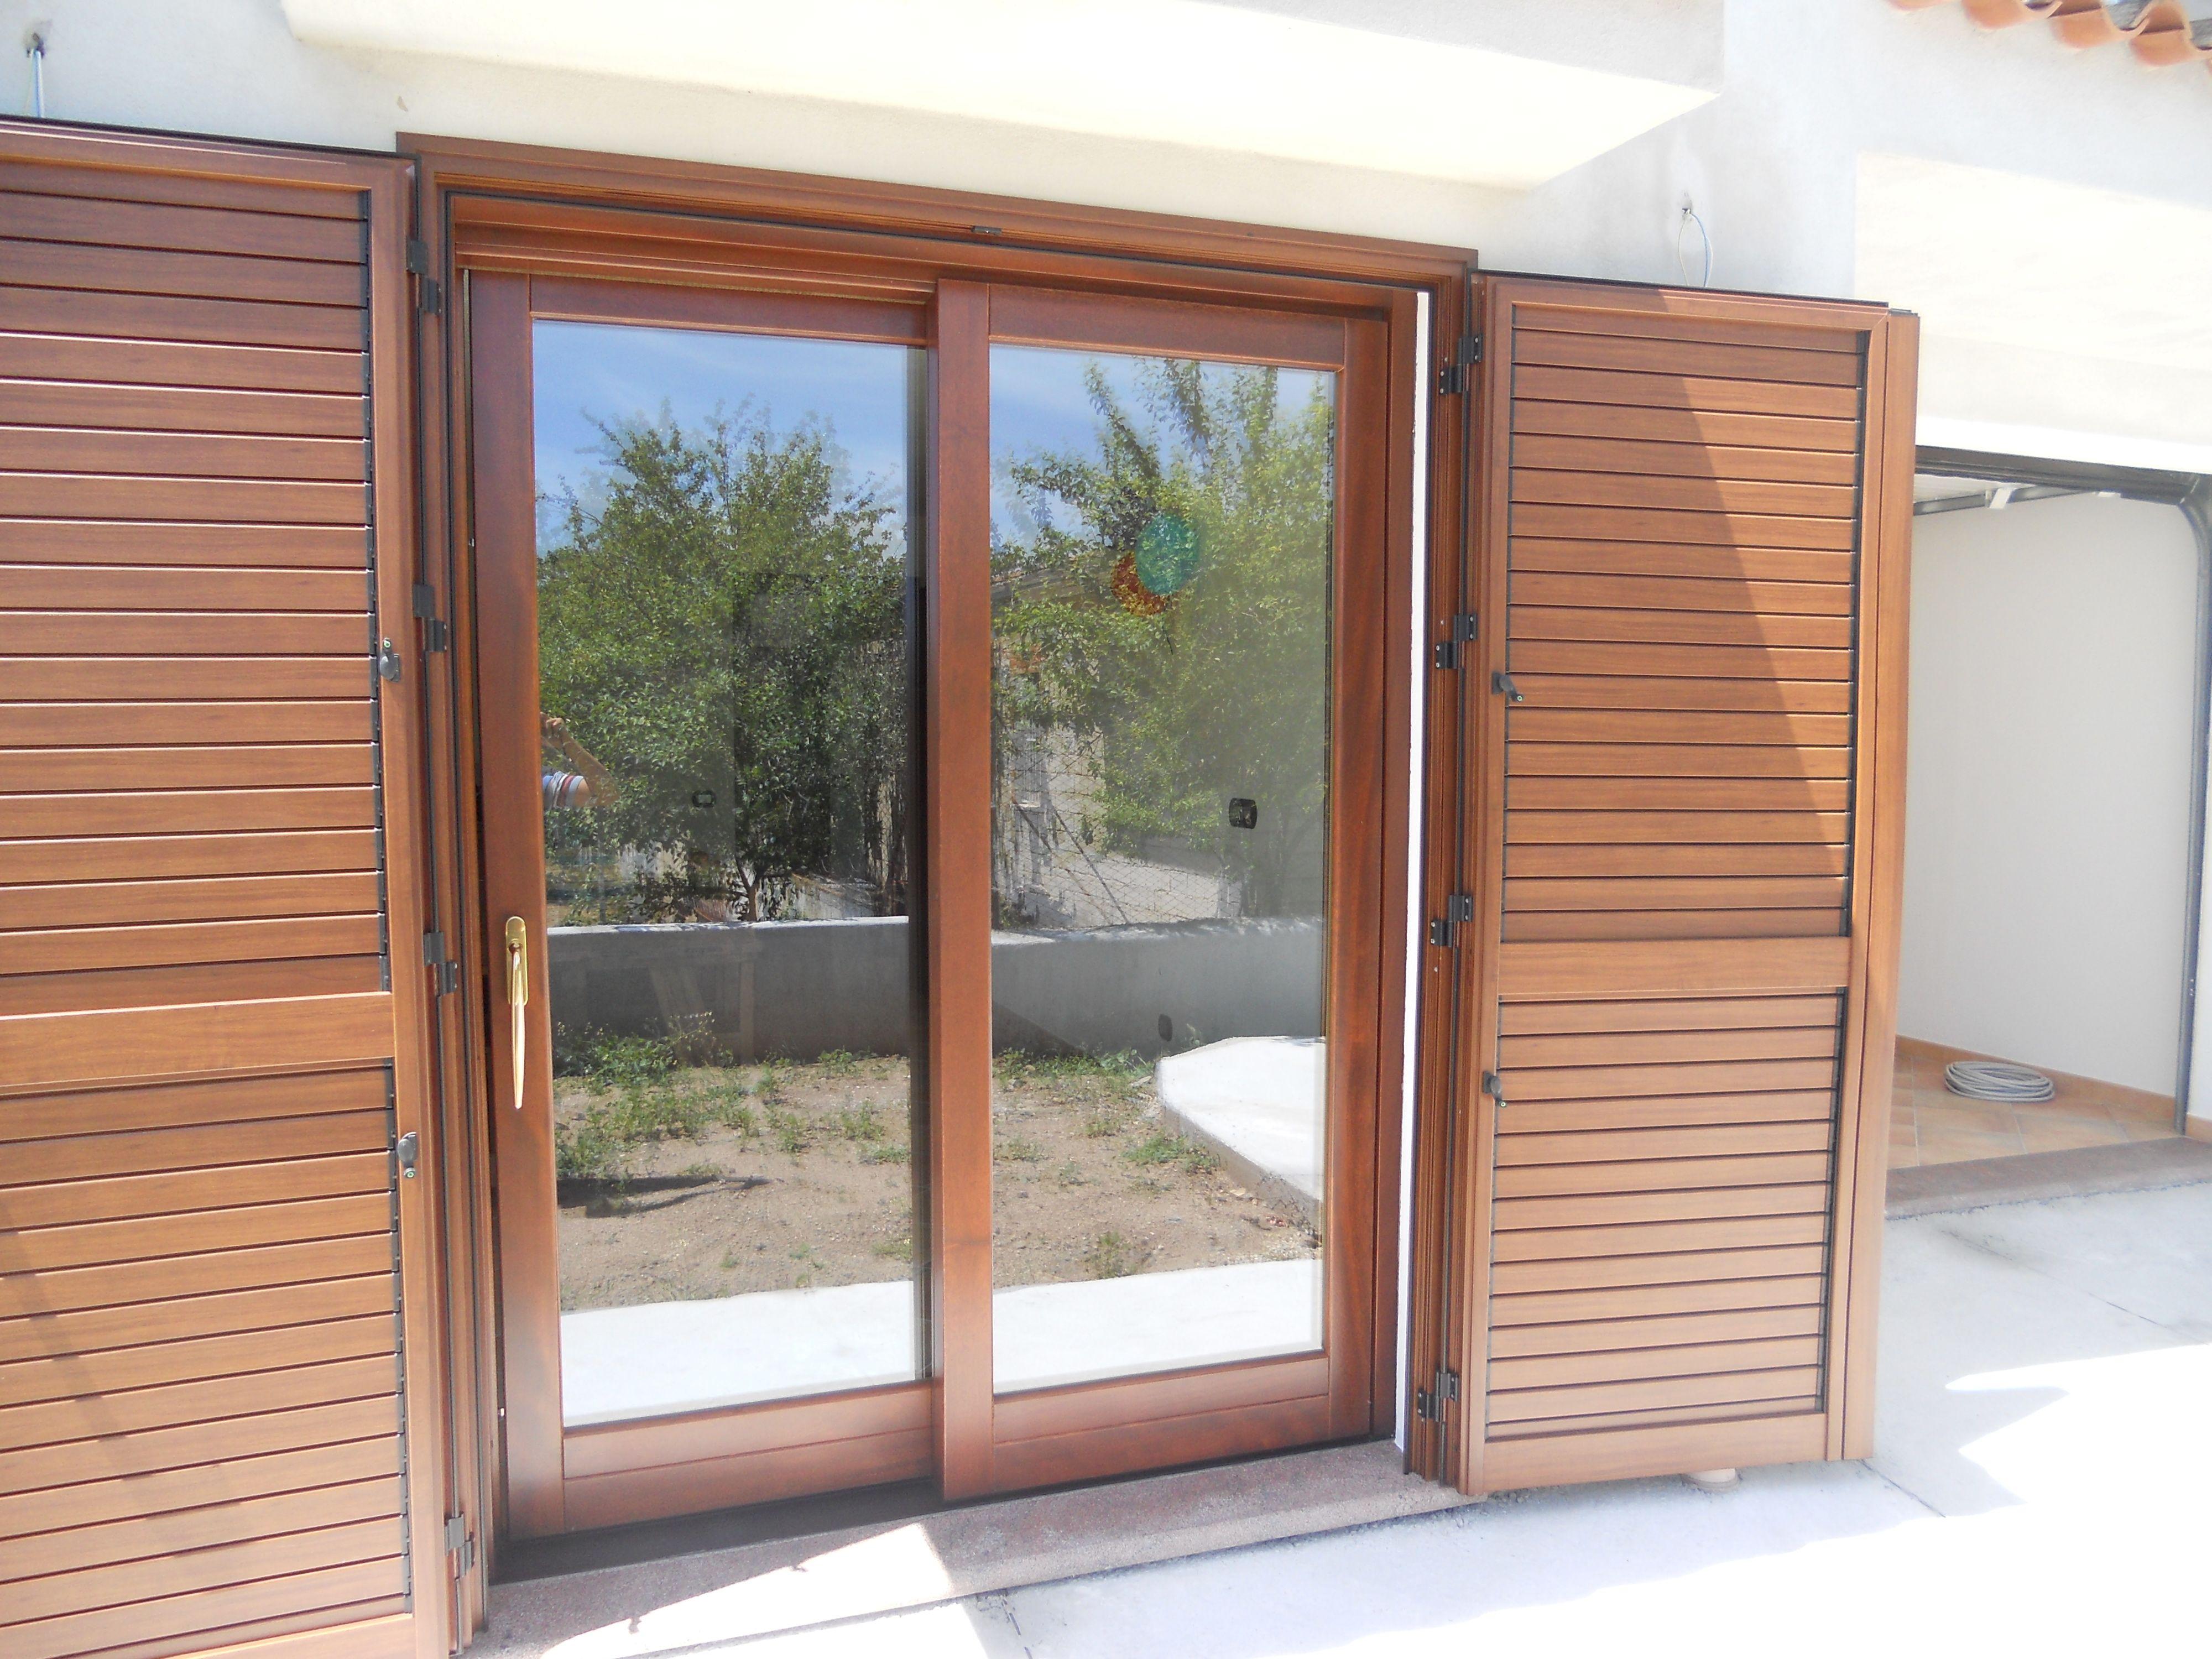 Soglie finestre moderne free soglie per porte e finestre - Soglie finestre prezzi ...